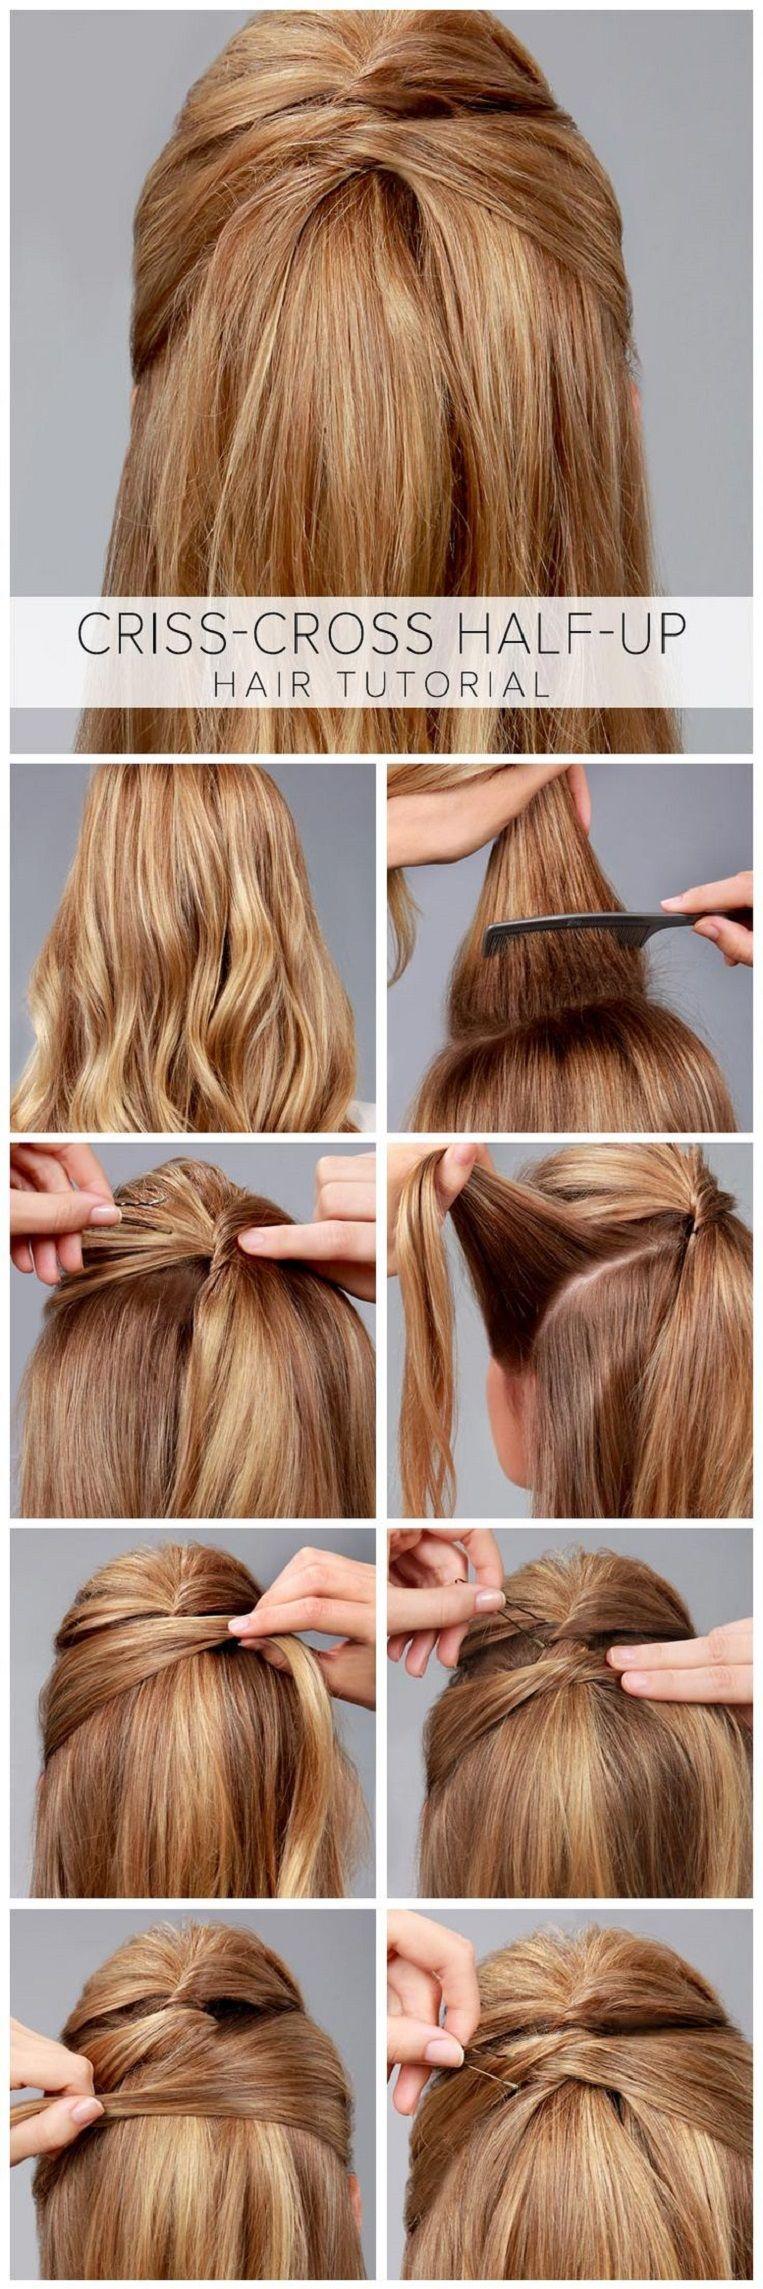 Crisscross halfup hair tutorial easy tutorials to look